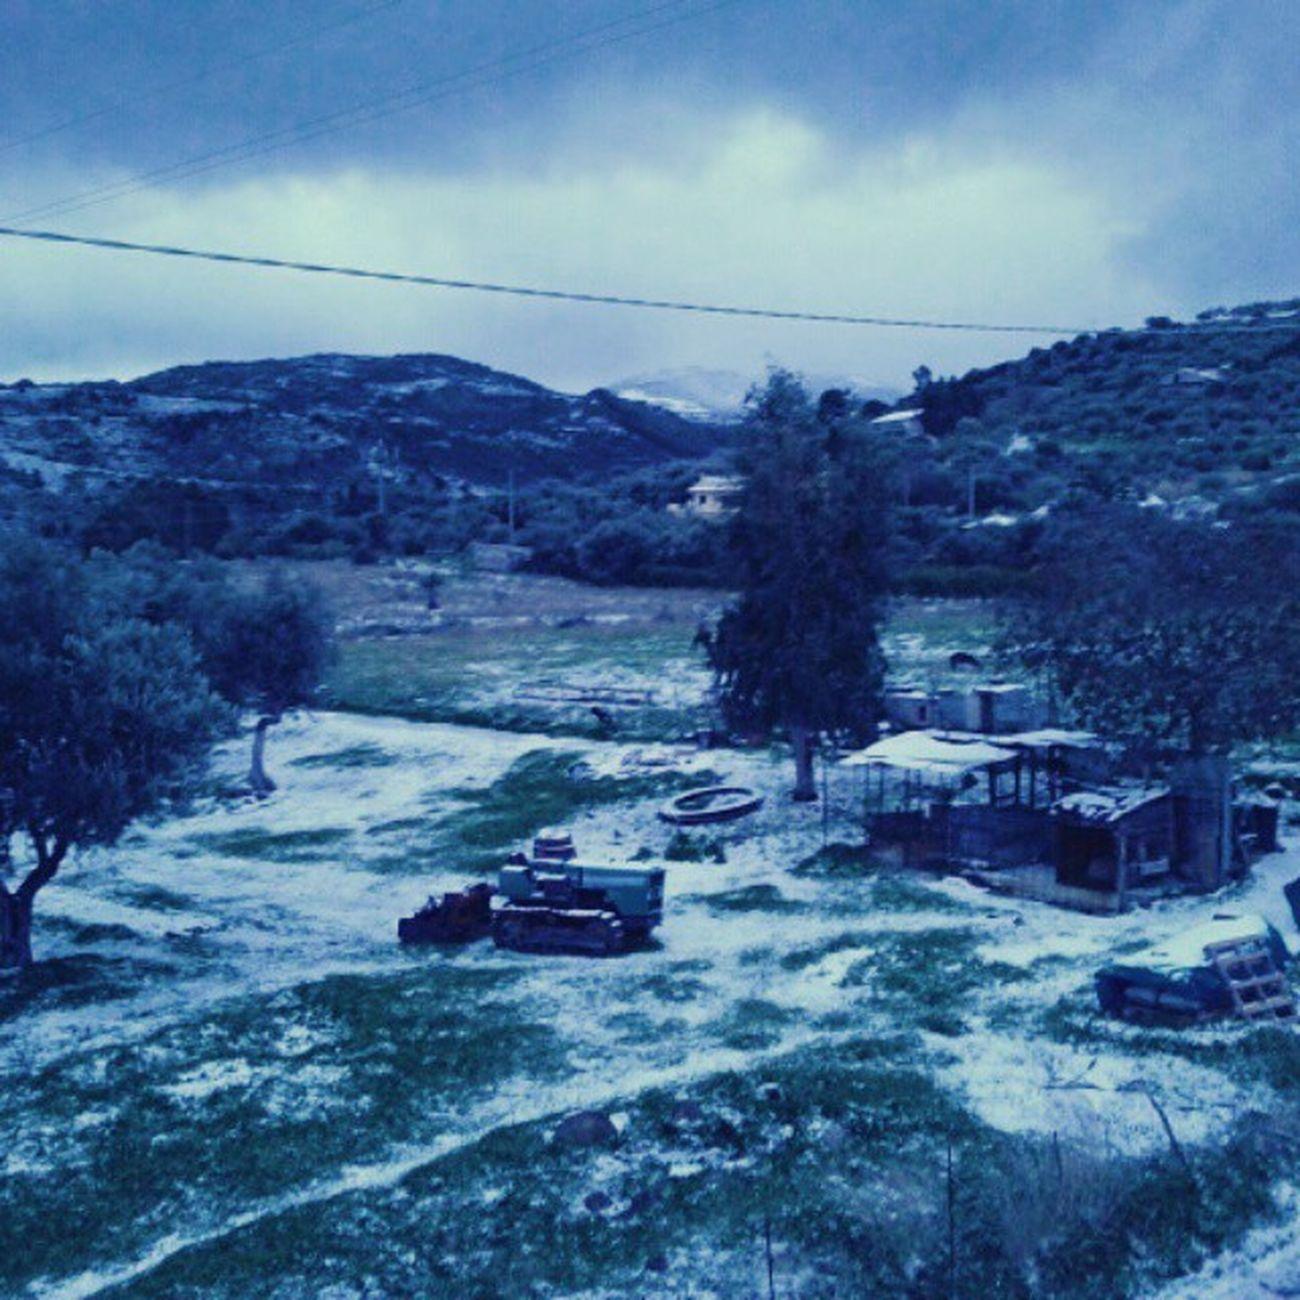 Neve Snow Acquedolci Contradaoliveto freddobellissimo